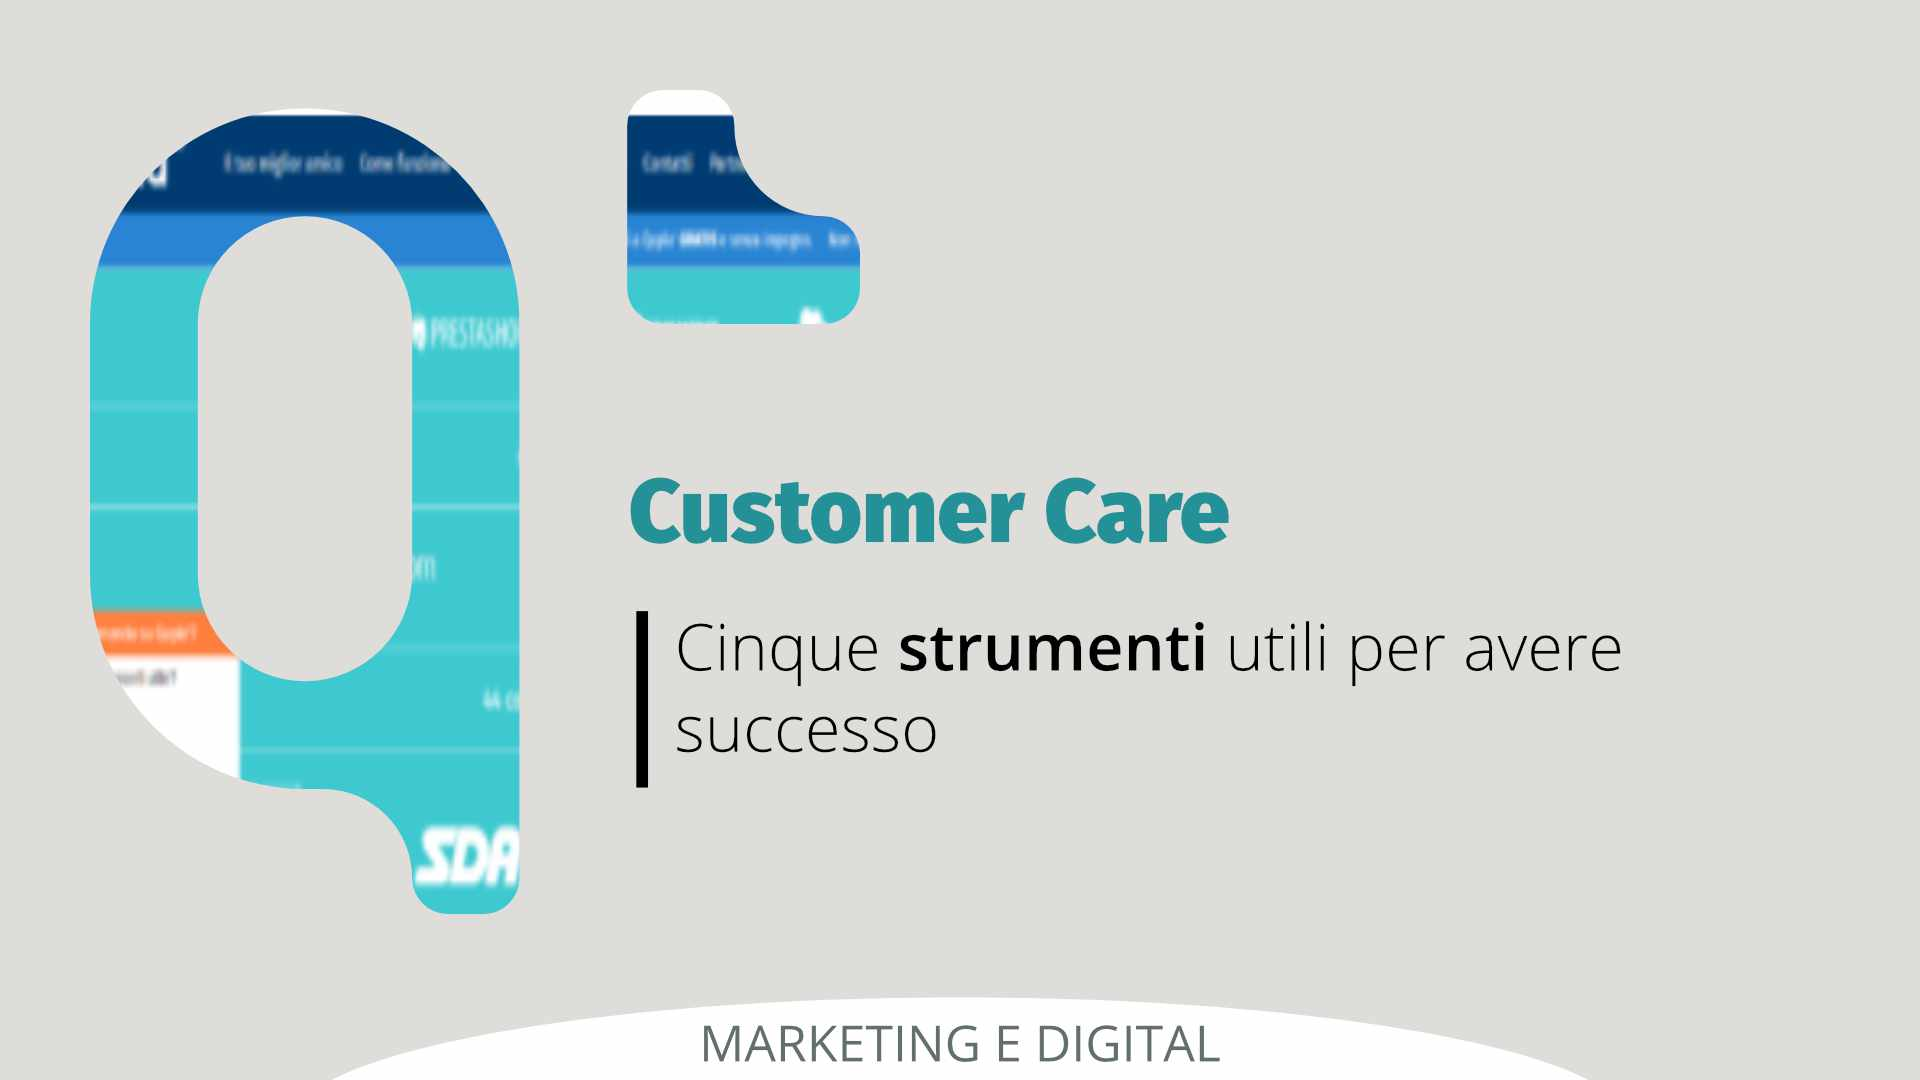 Customer Care successo